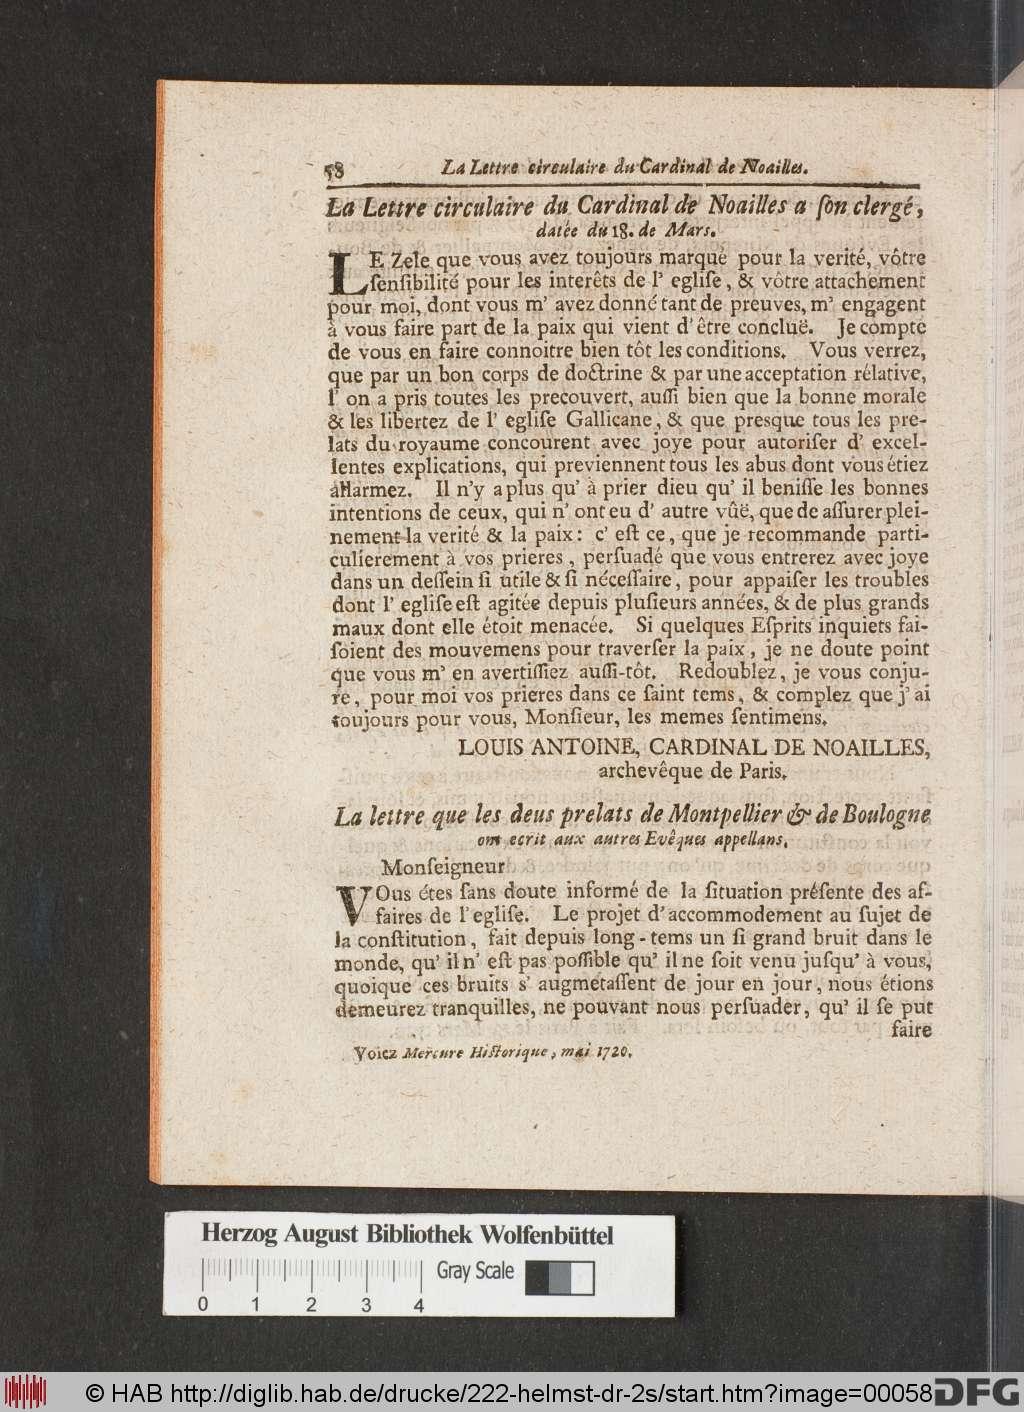 http://diglib.hab.de/drucke/222-helmst-dr-2s/00058.jpg